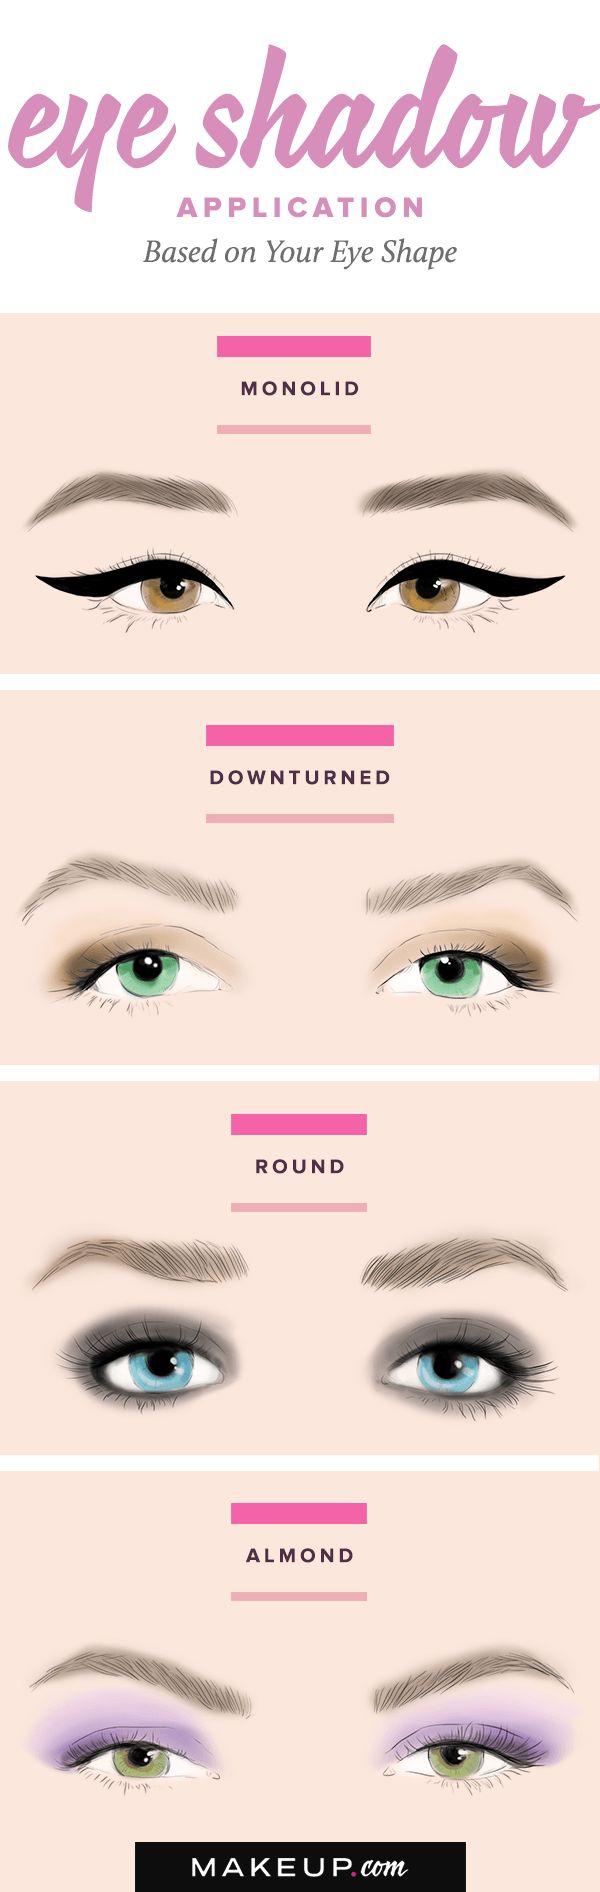 Eye Shadow for Your Eye Shape